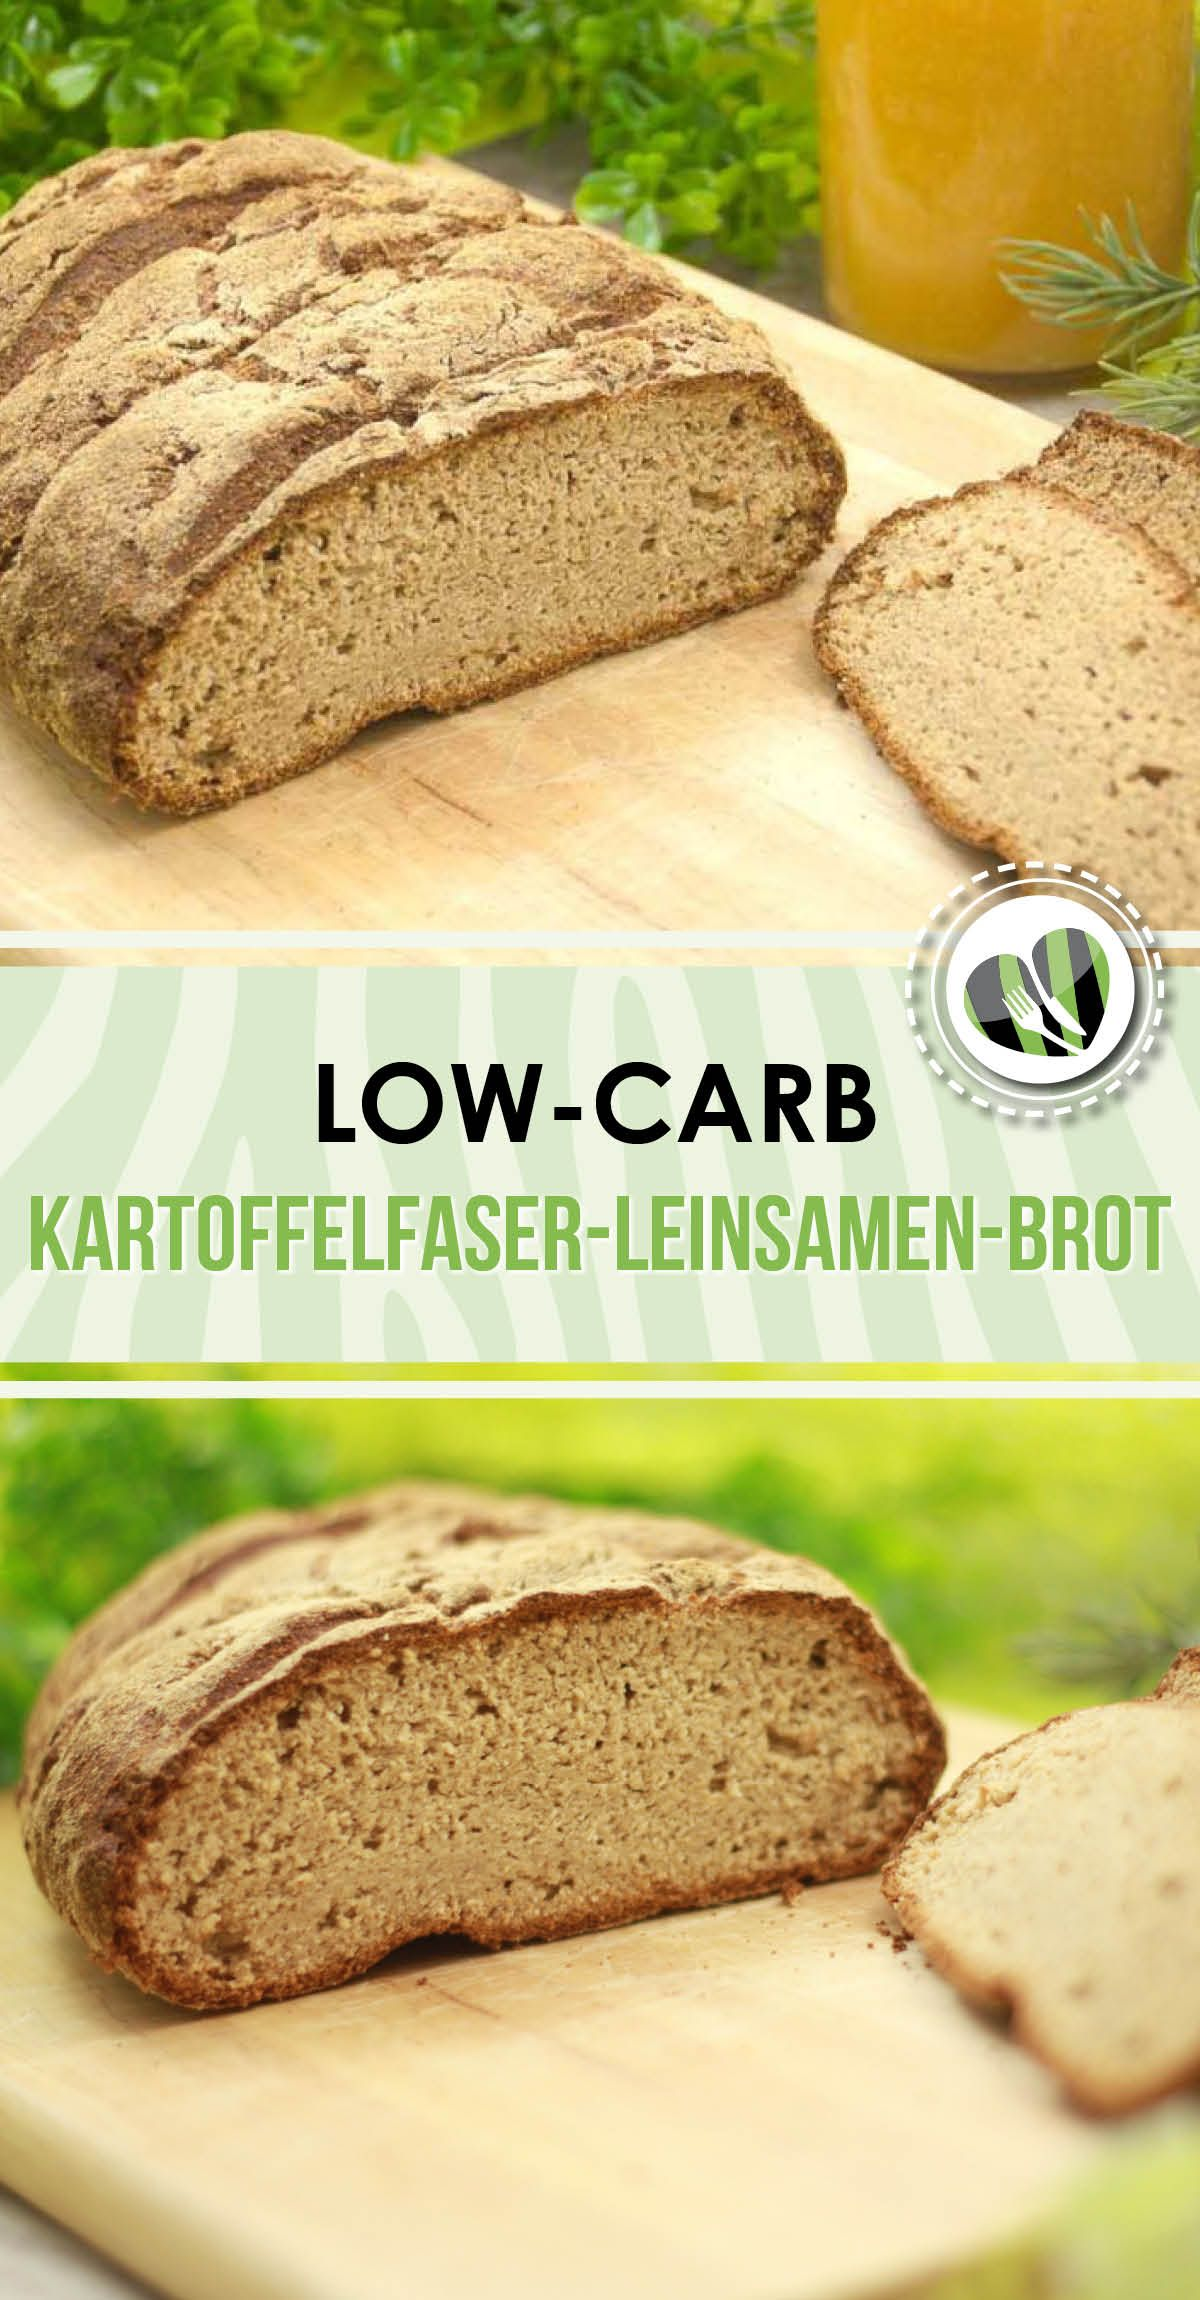 kartoffelfaser leinsamen brot recipe a guide to keto low carb paleo brot gluten glutenfrei. Black Bedroom Furniture Sets. Home Design Ideas